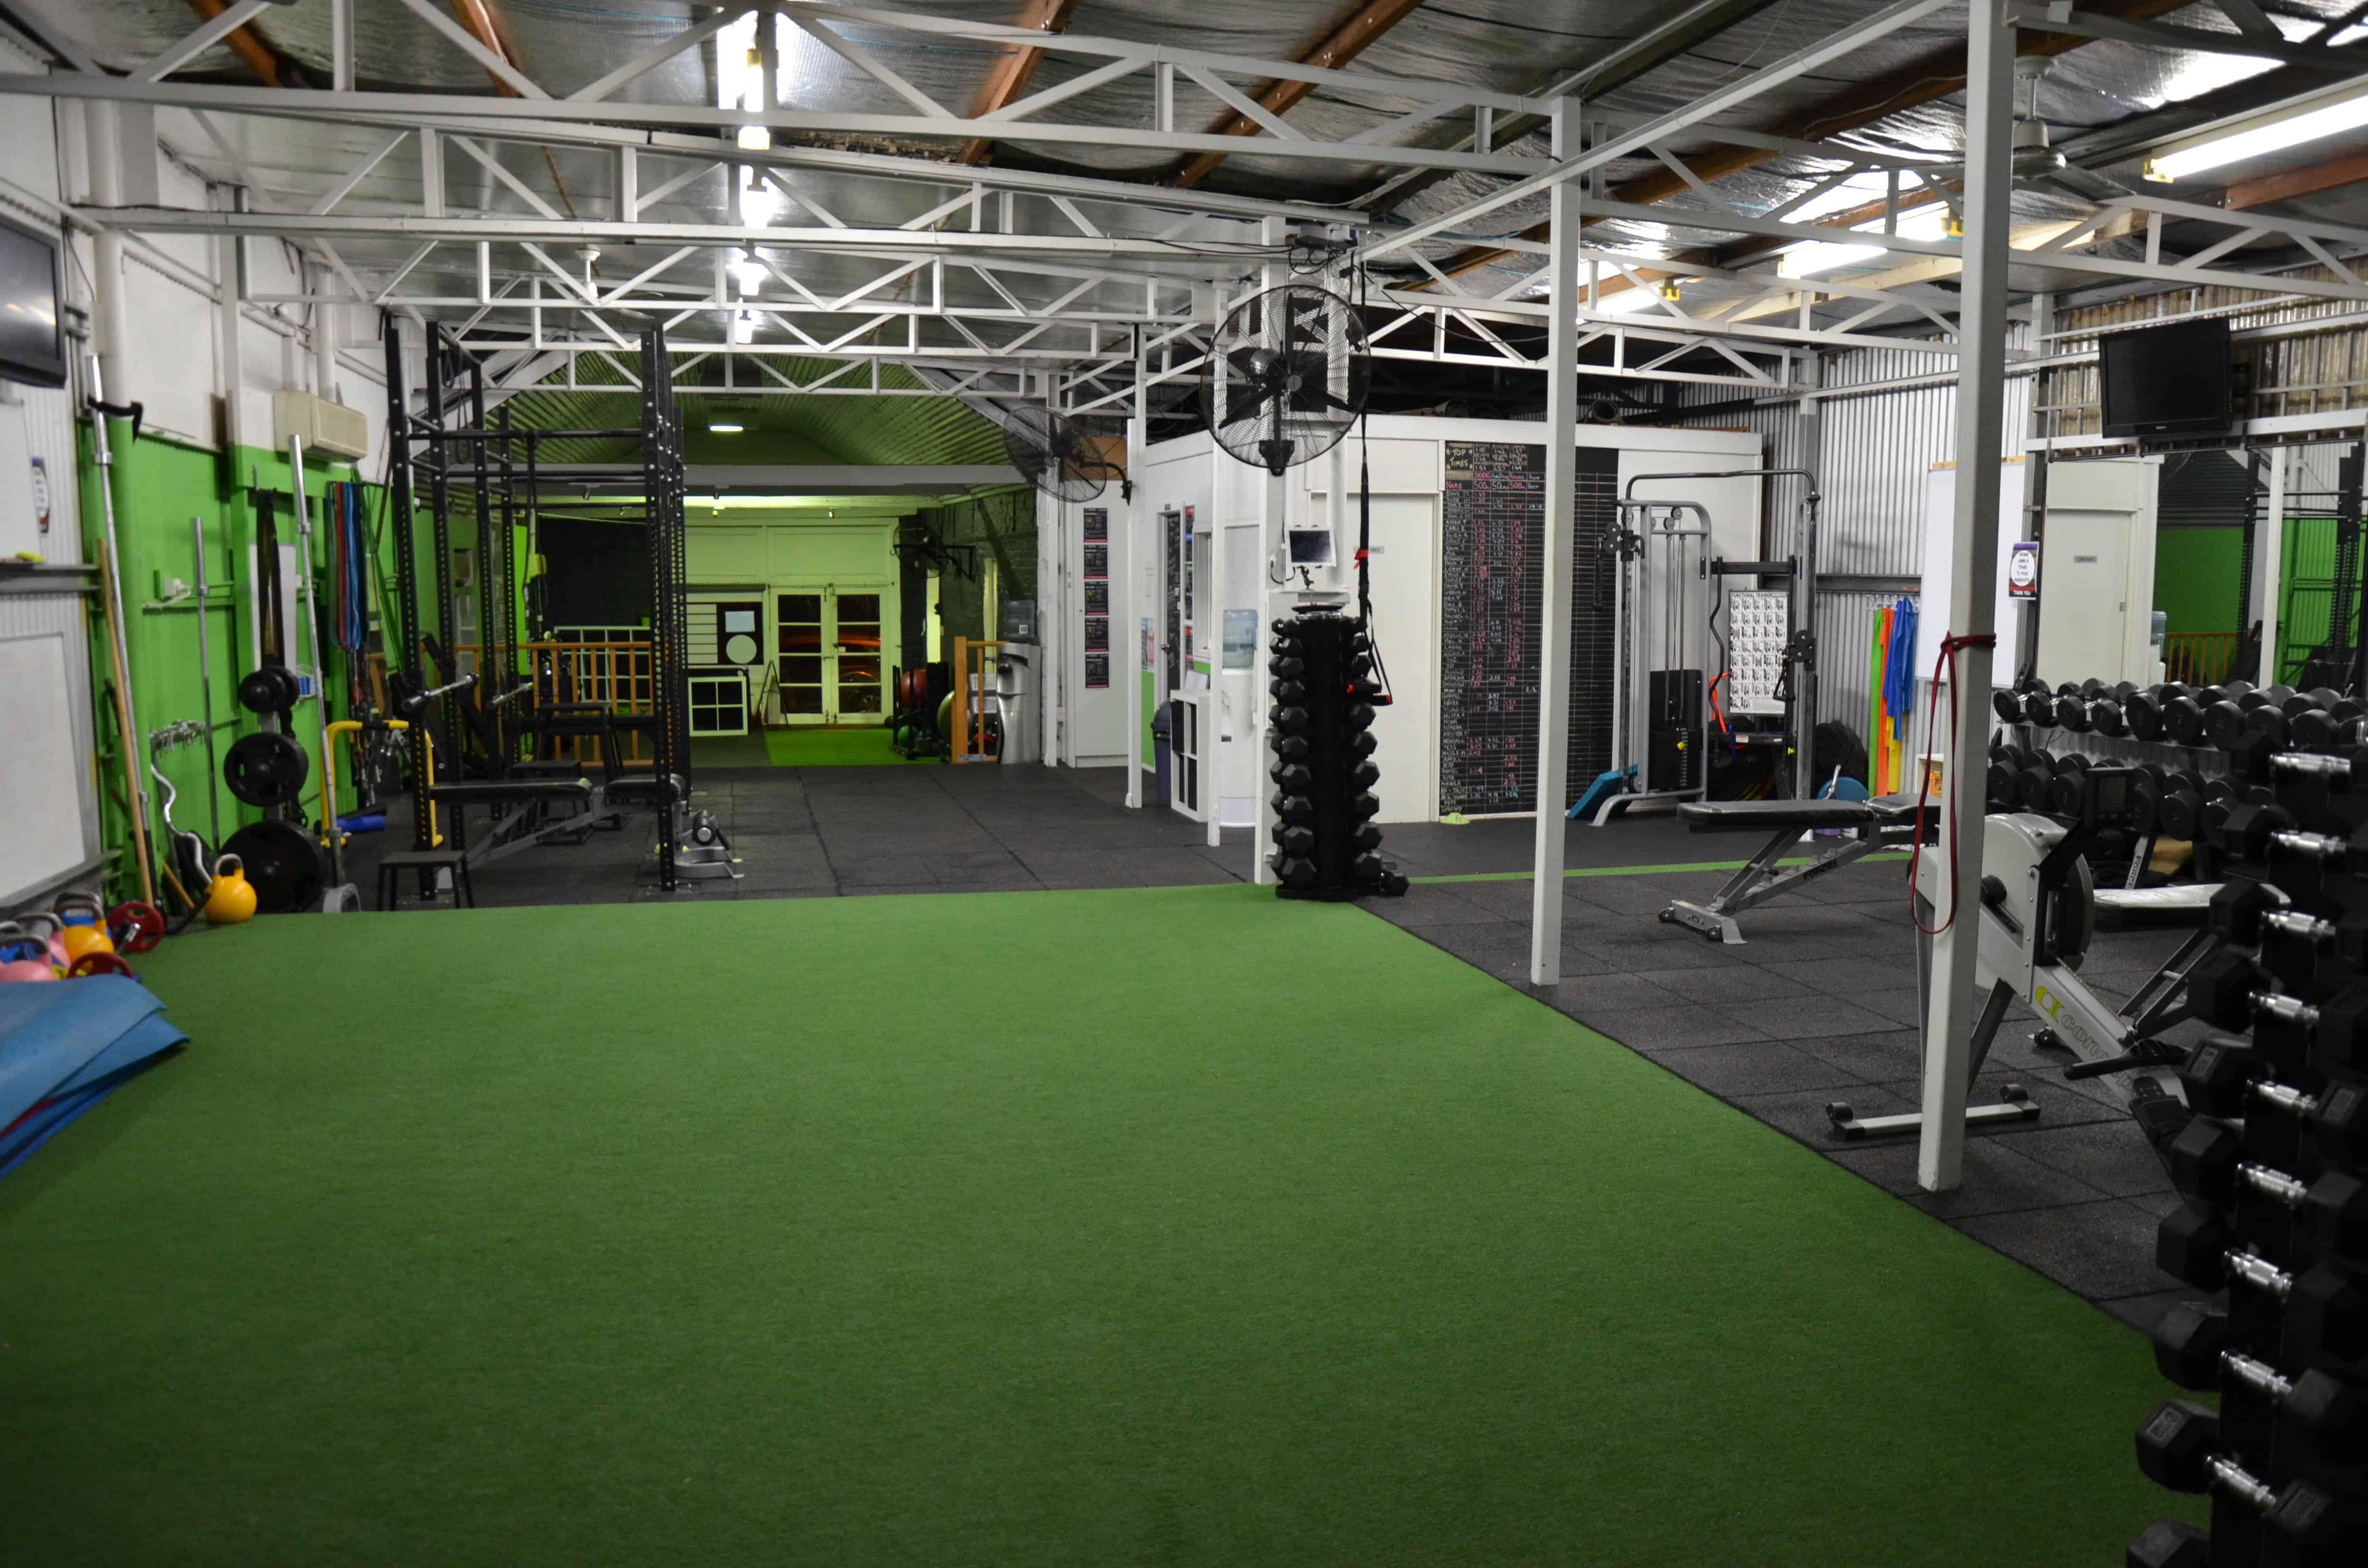 Personal Trainer Gym and Studio Setup